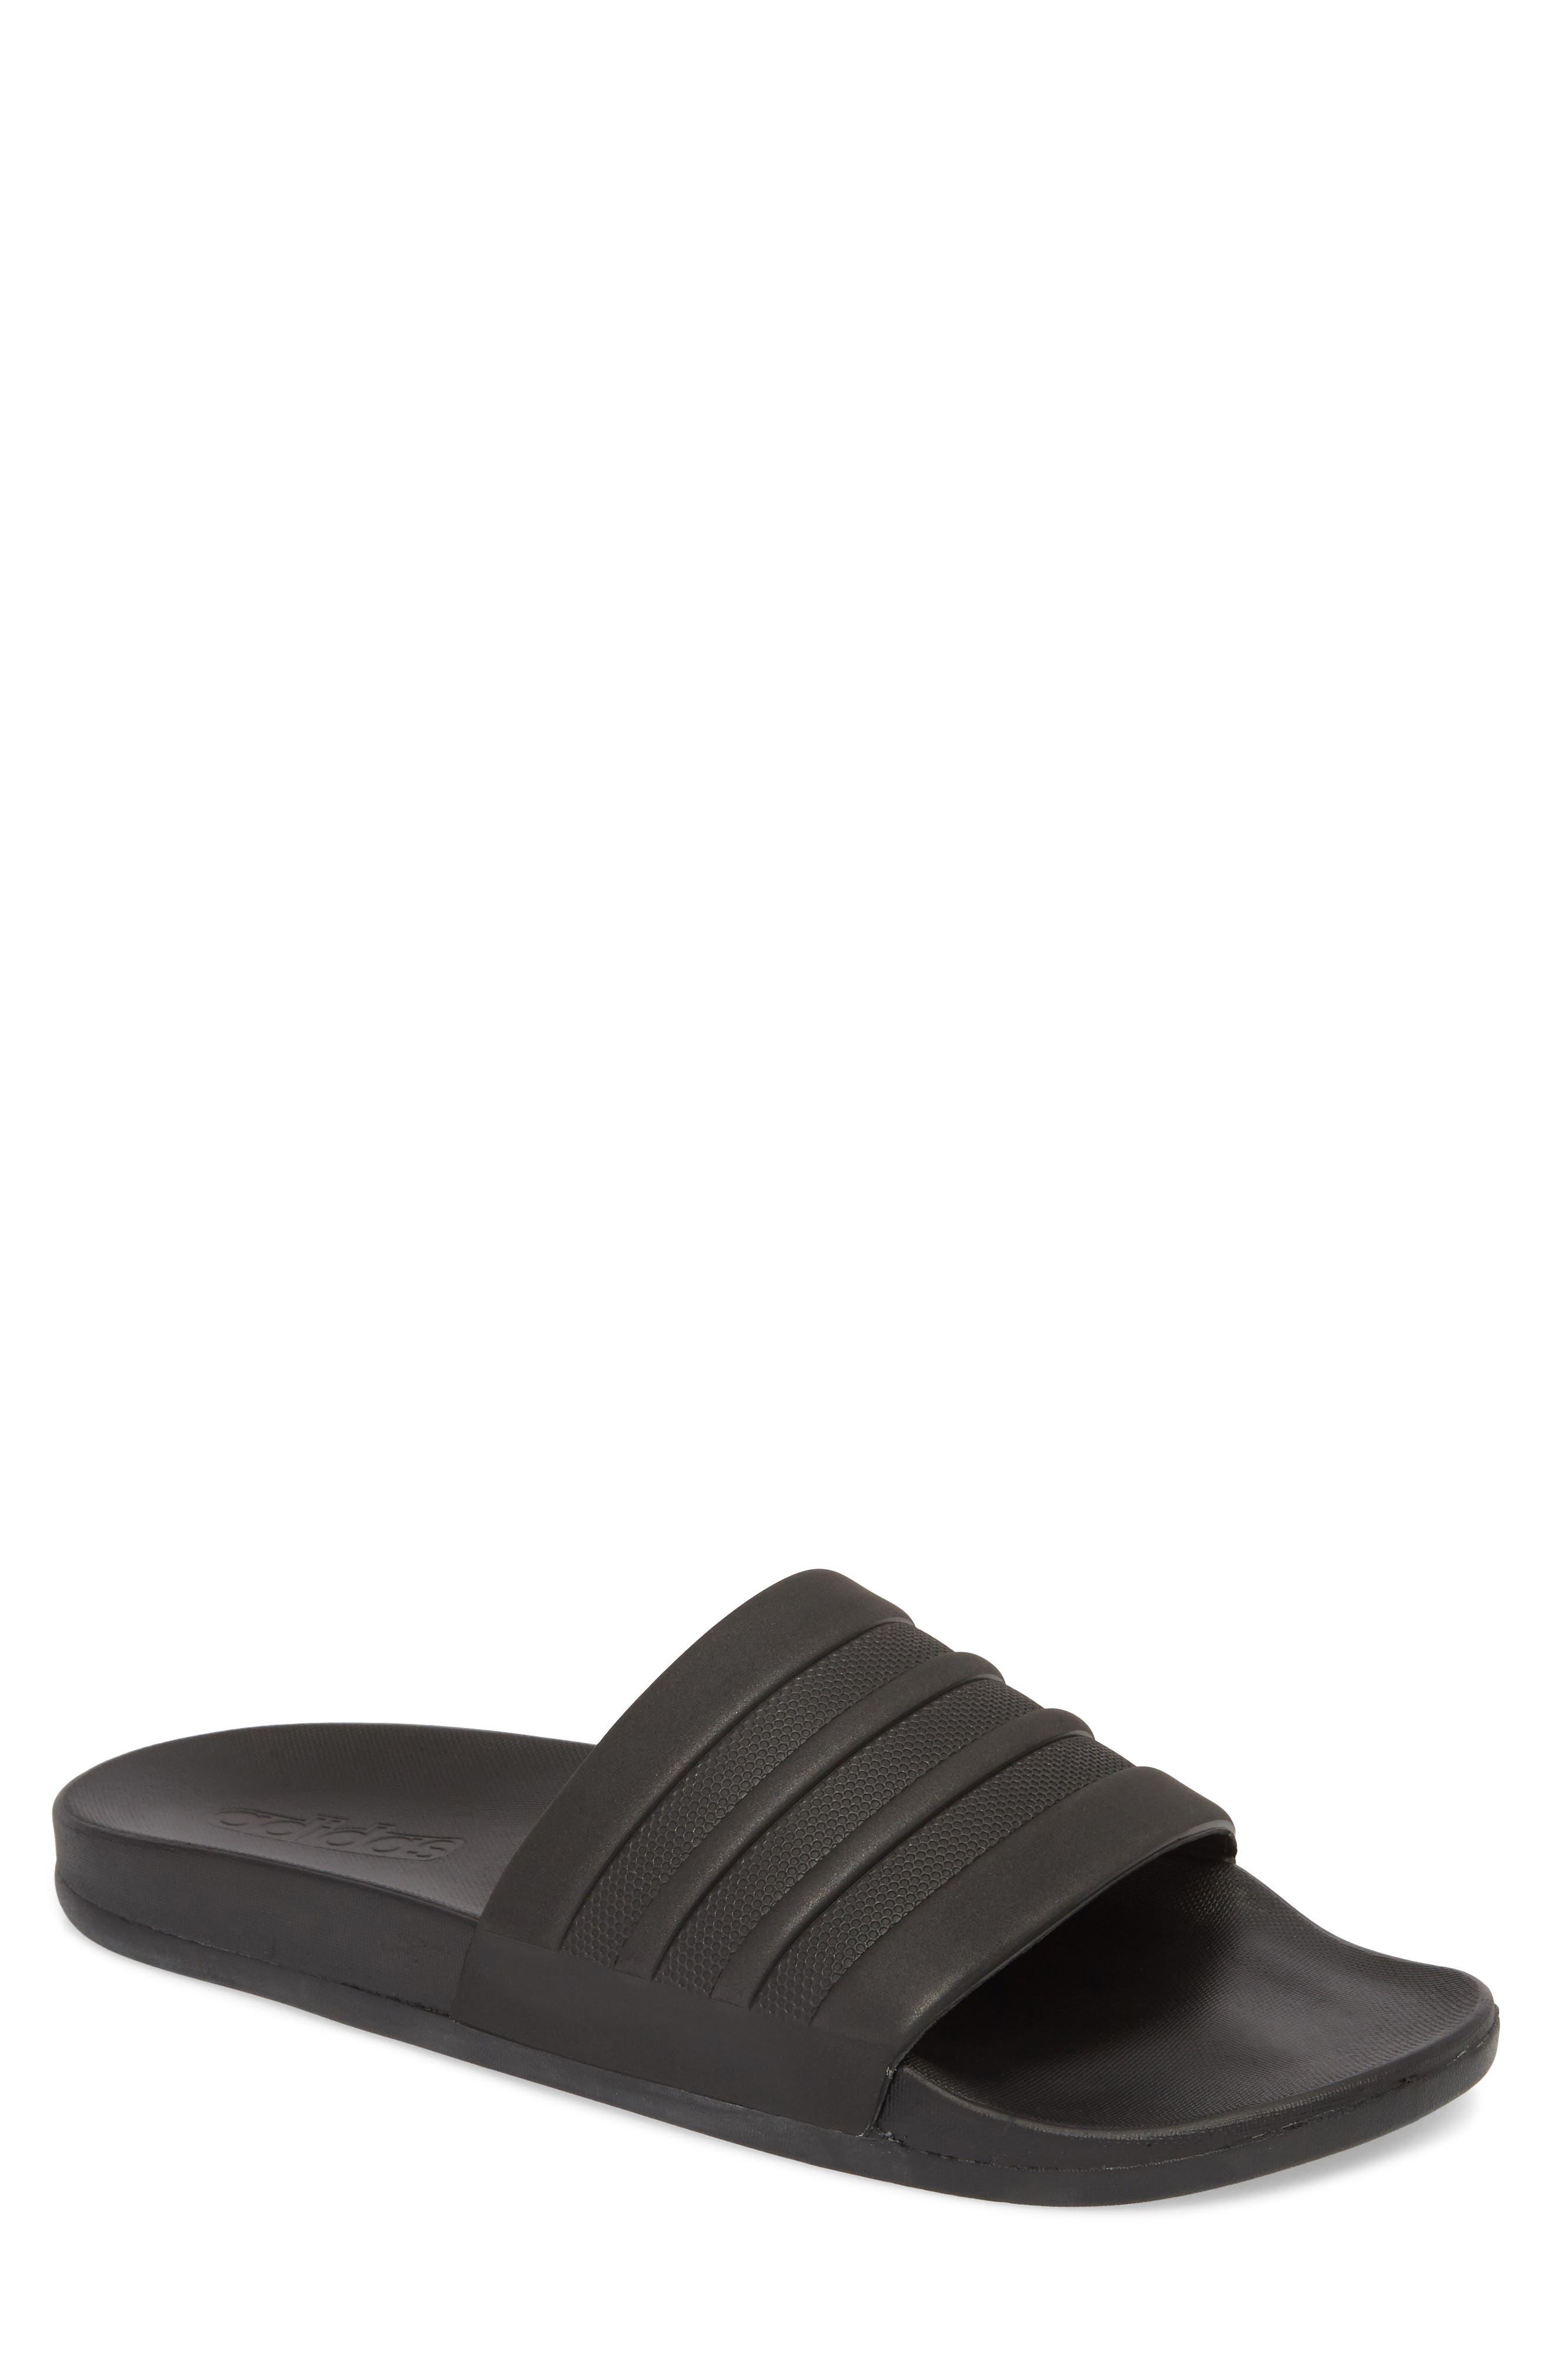 ADIDAS Adilette Cloudfoam Mono Sport Slide Sandal, Main, color, BLACK/ BLACK